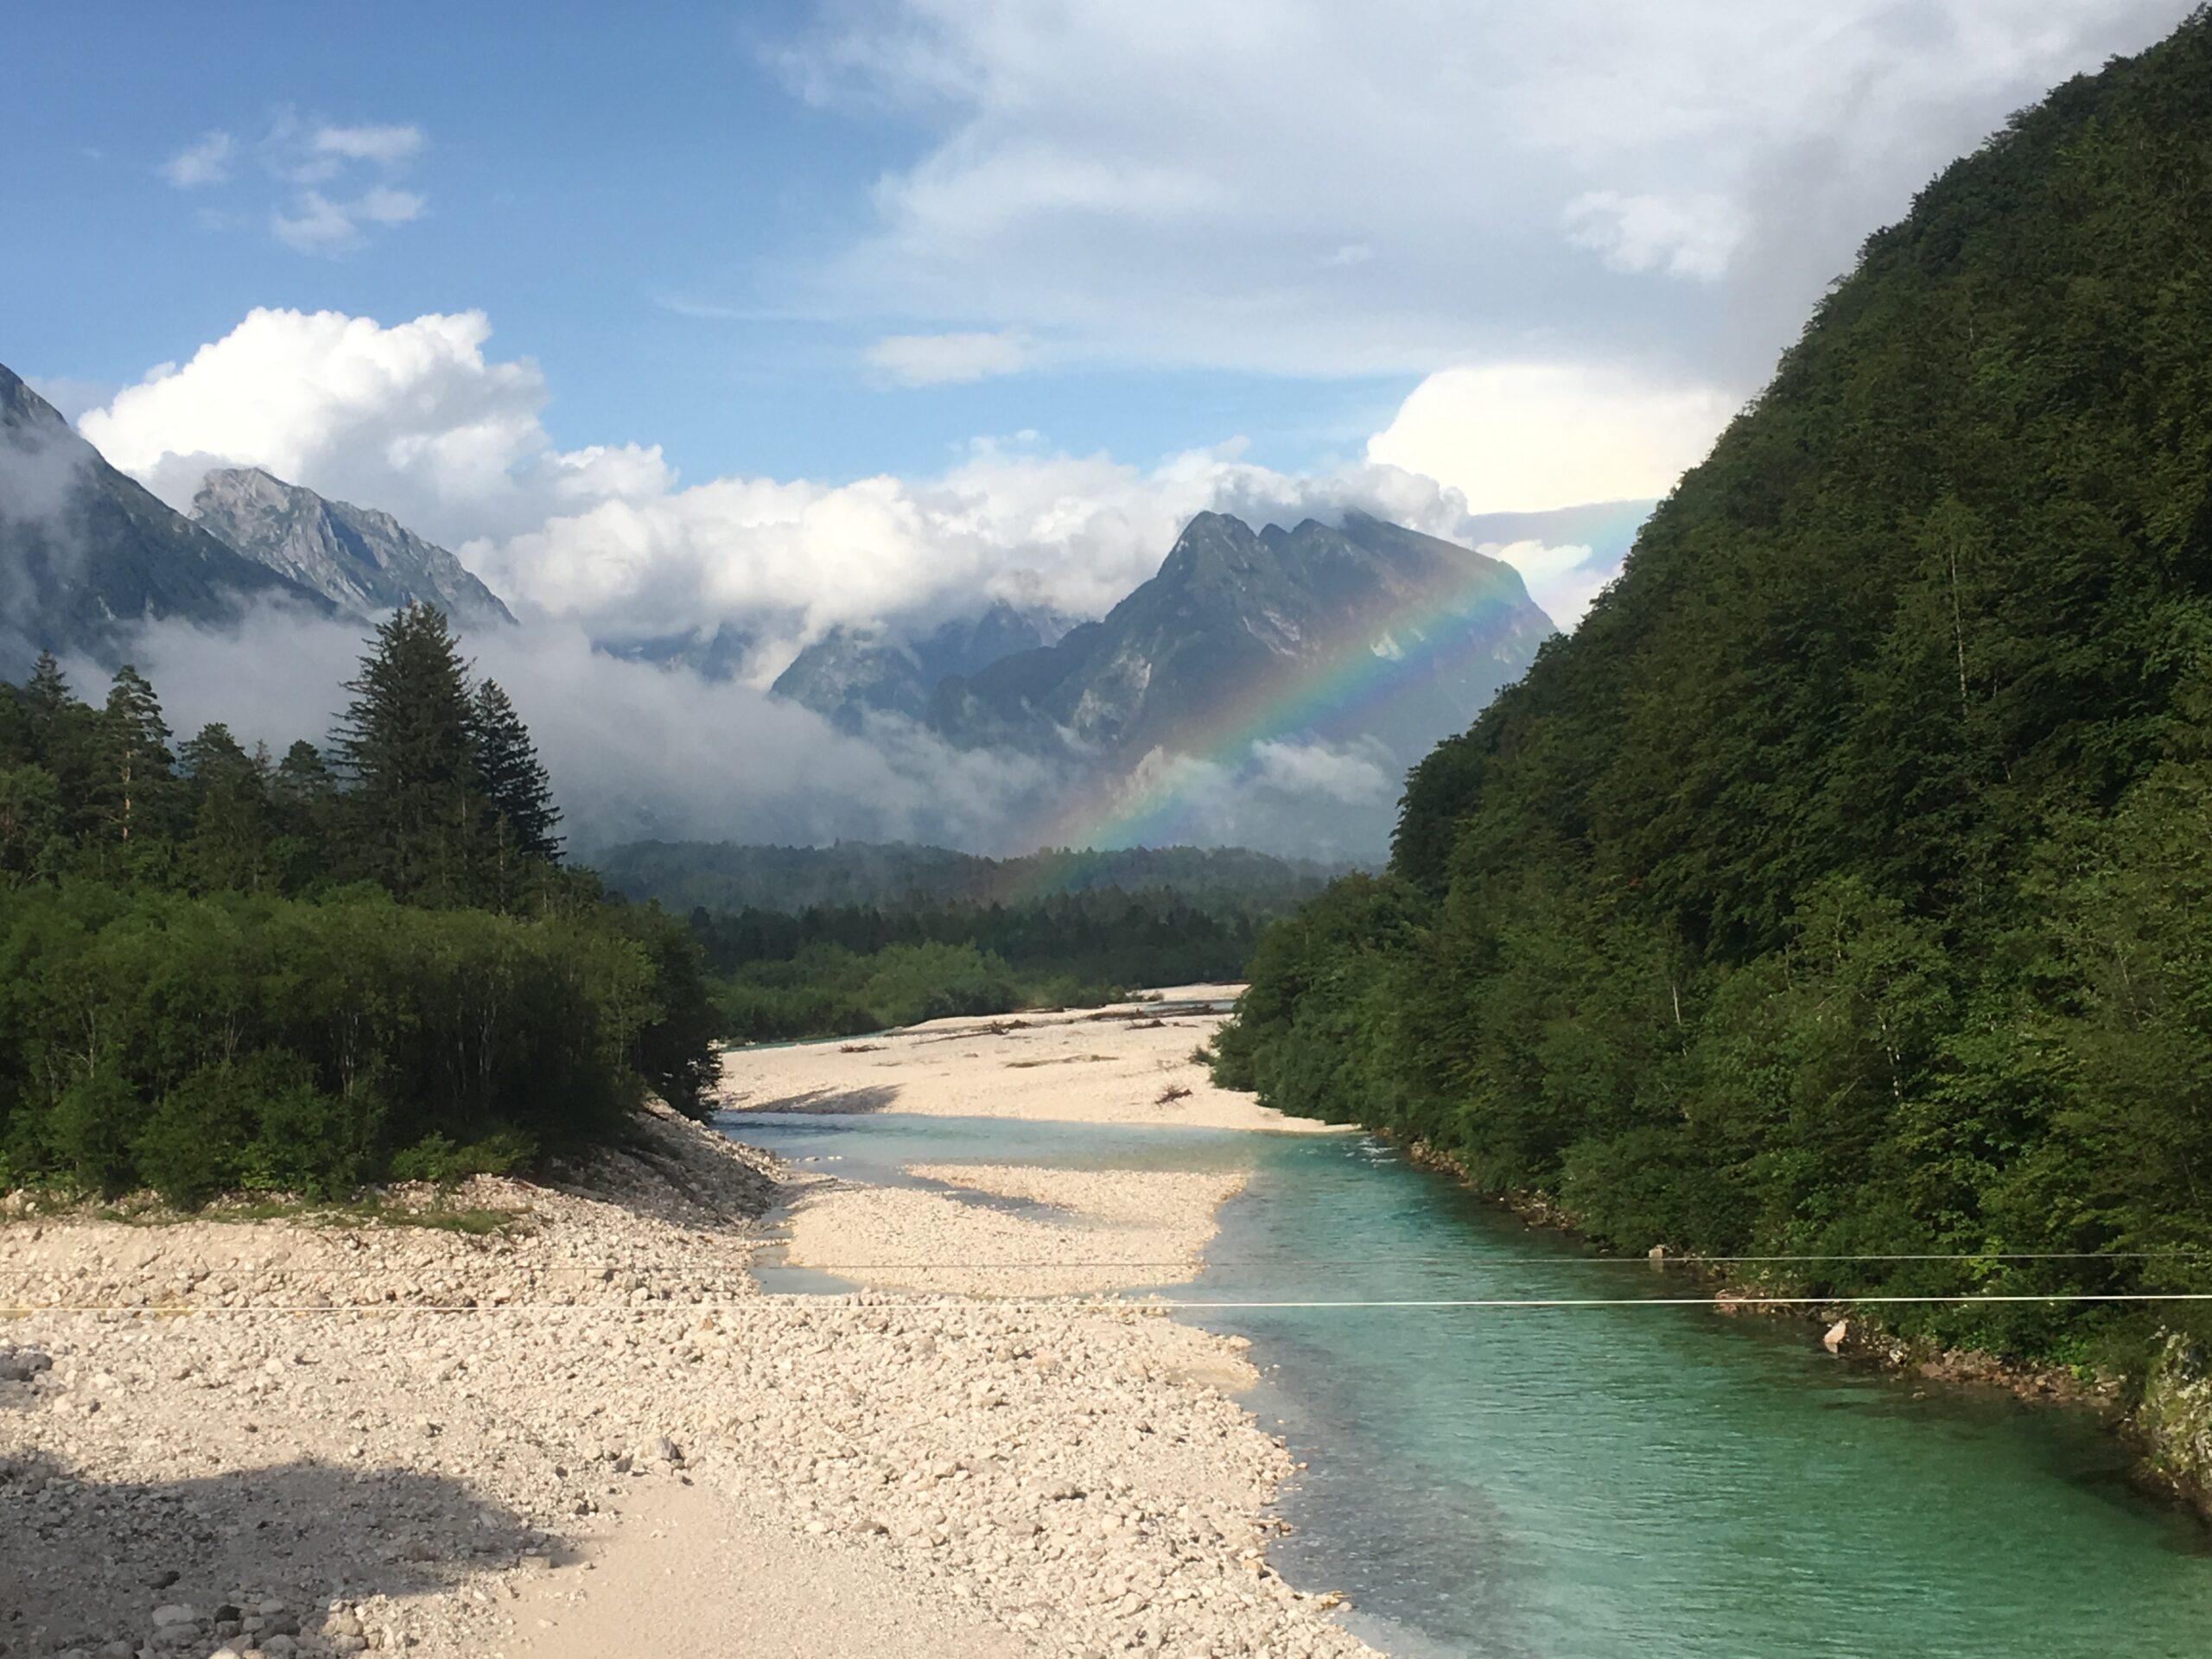 Coaching-Reise-Klettern-Rafting-Abseilen-Klettersteige-Abspruenge-wagen-Coaching-Urlaub-Retreat Urlaub in Slowenien